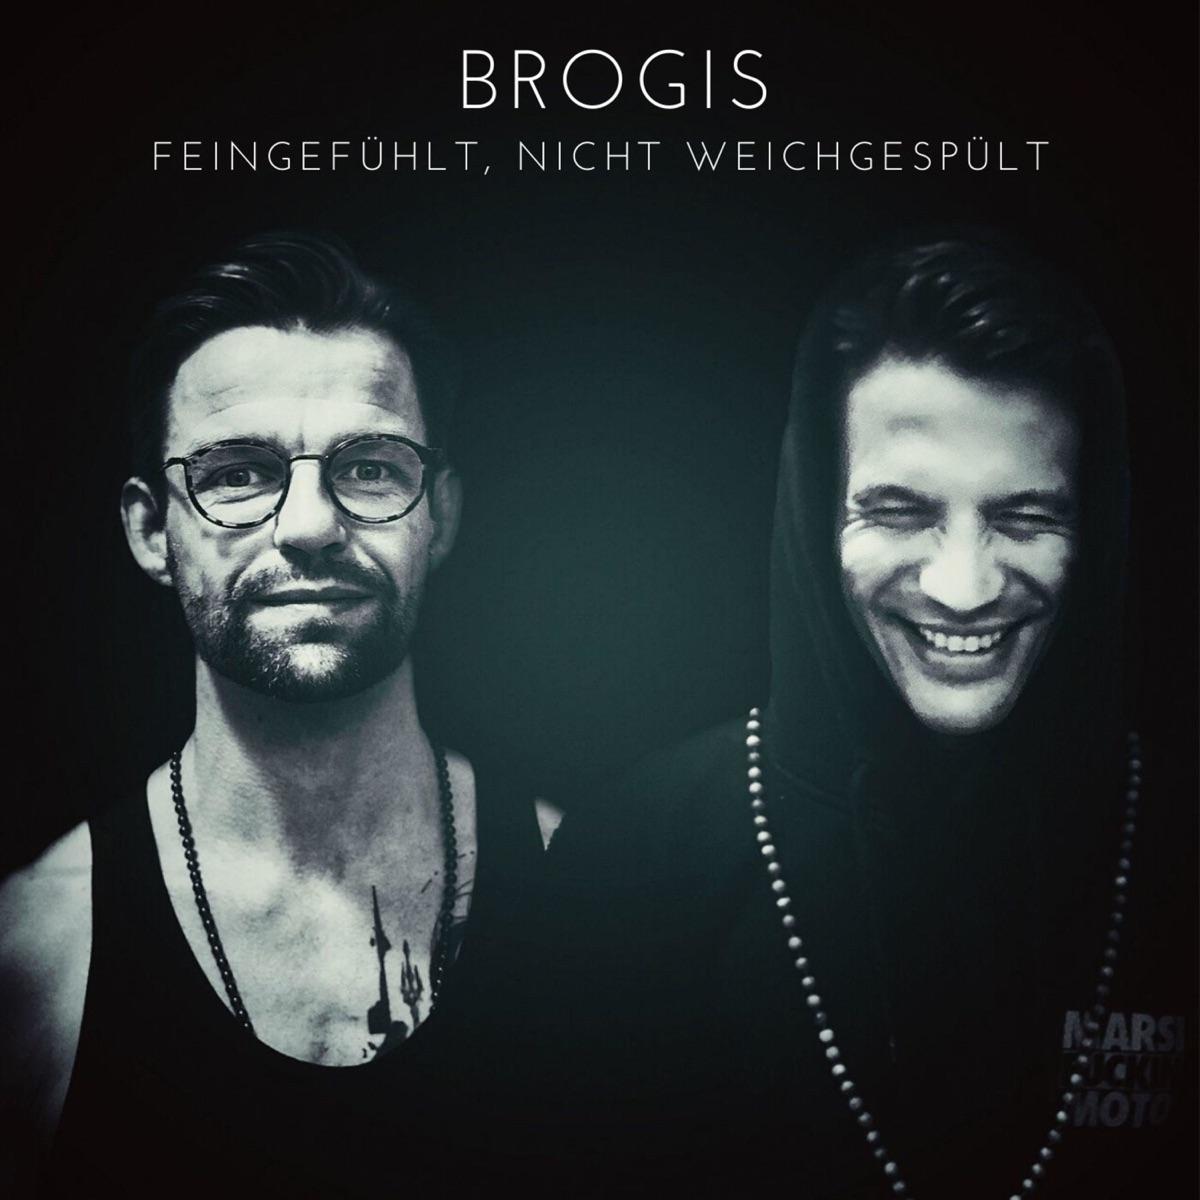 Brogis - feingefühlt, nicht weichgespült